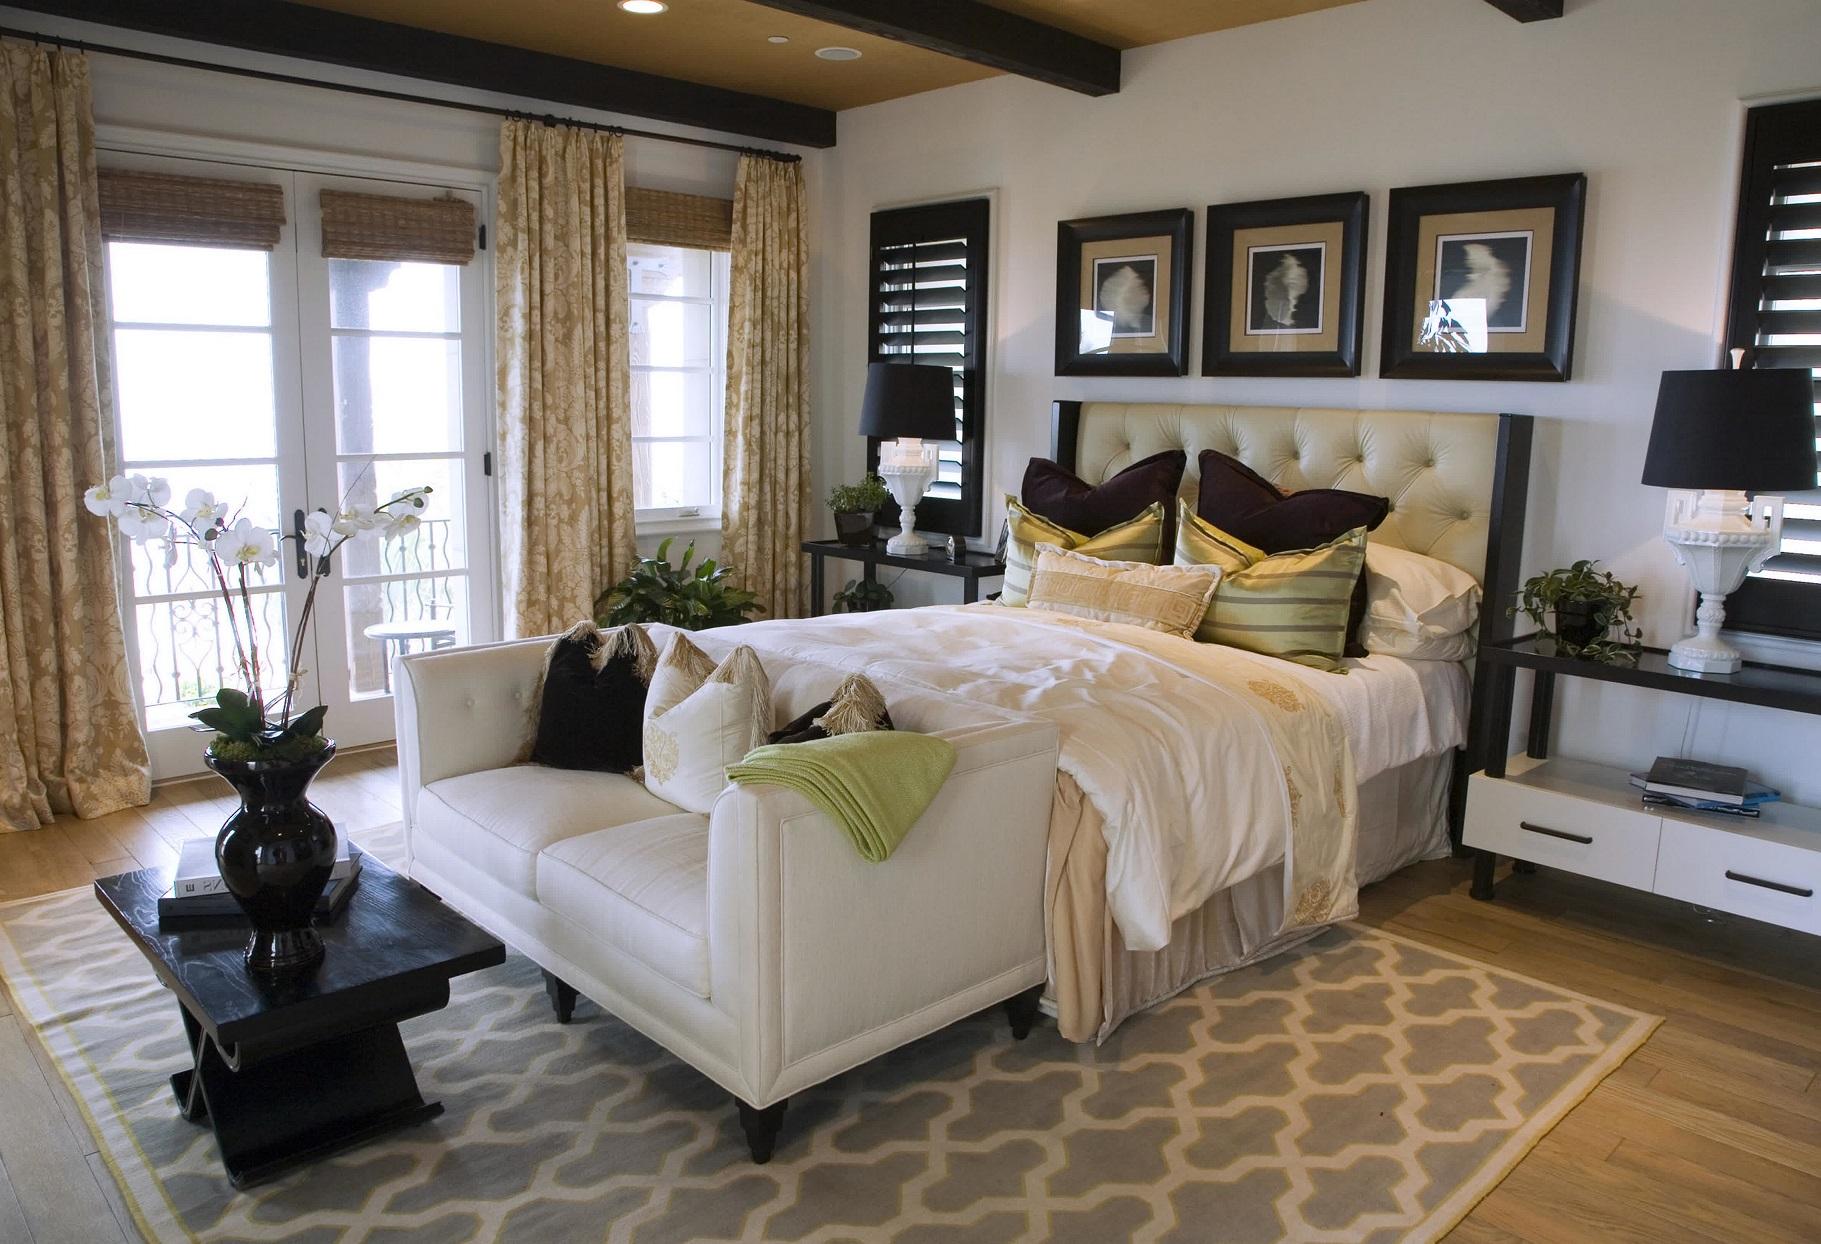 Kamar dengan Perabot Rapi dan Lukisan Berjejer